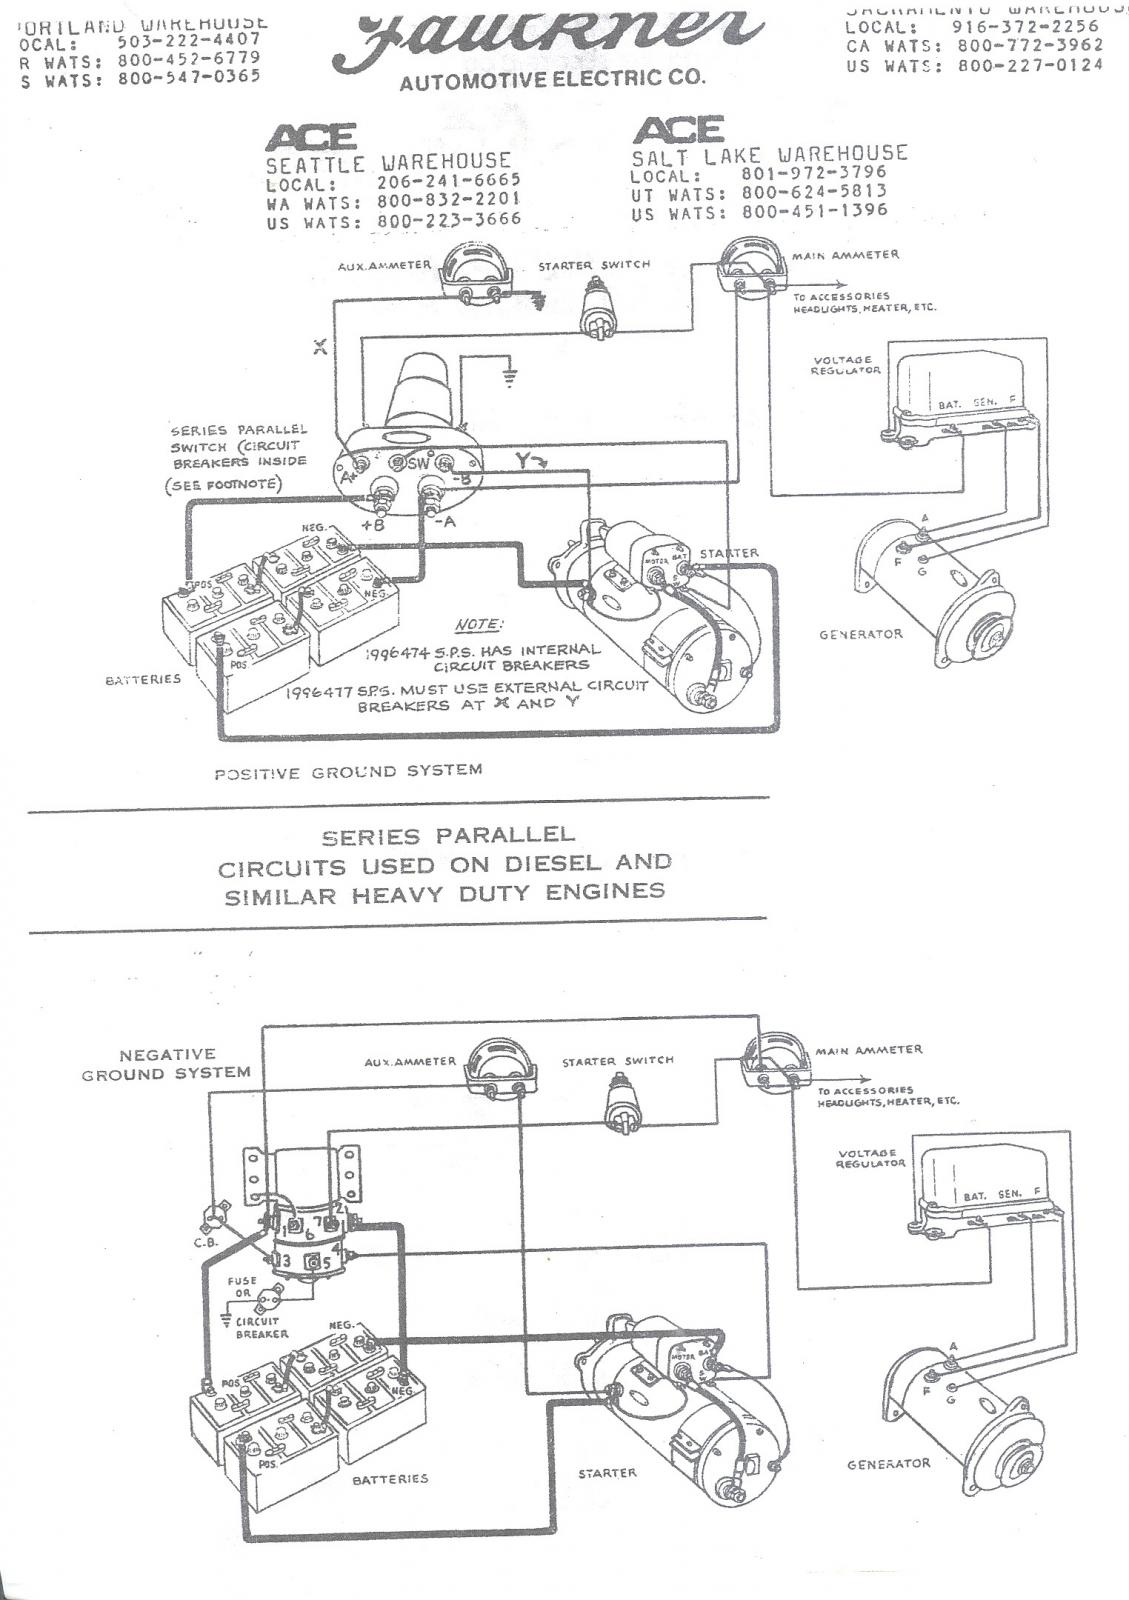 Series Parallel Wiring Diagram Kenworth - Wiring Diagram Data Oreo - Speaker Wiring Diagram Series Vs Parallel